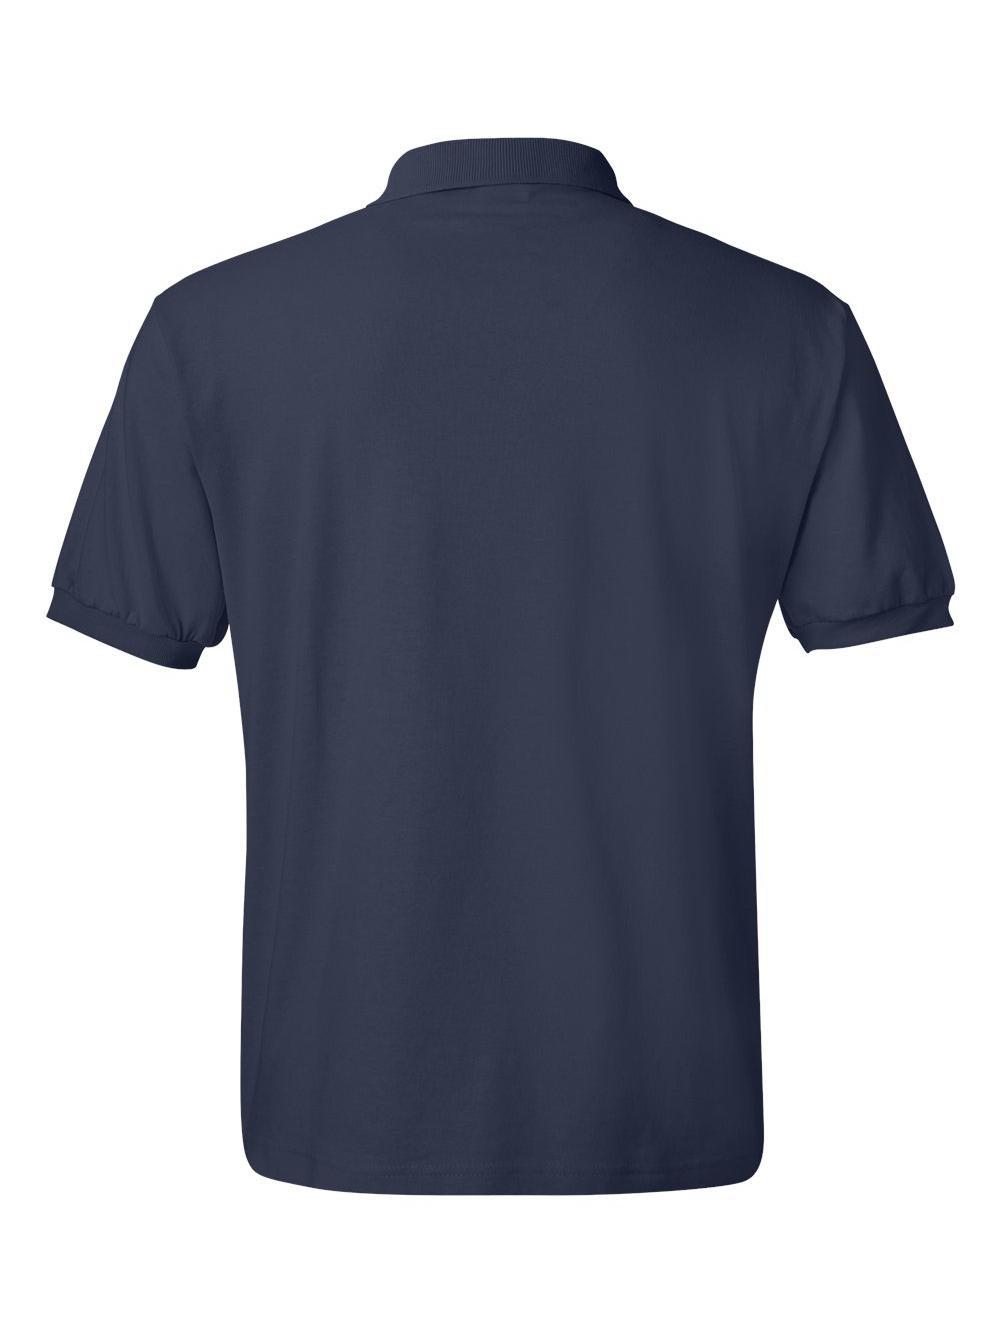 Hanes-Ecosmart-Jersey-Sport-Shirt-054X thumbnail 34